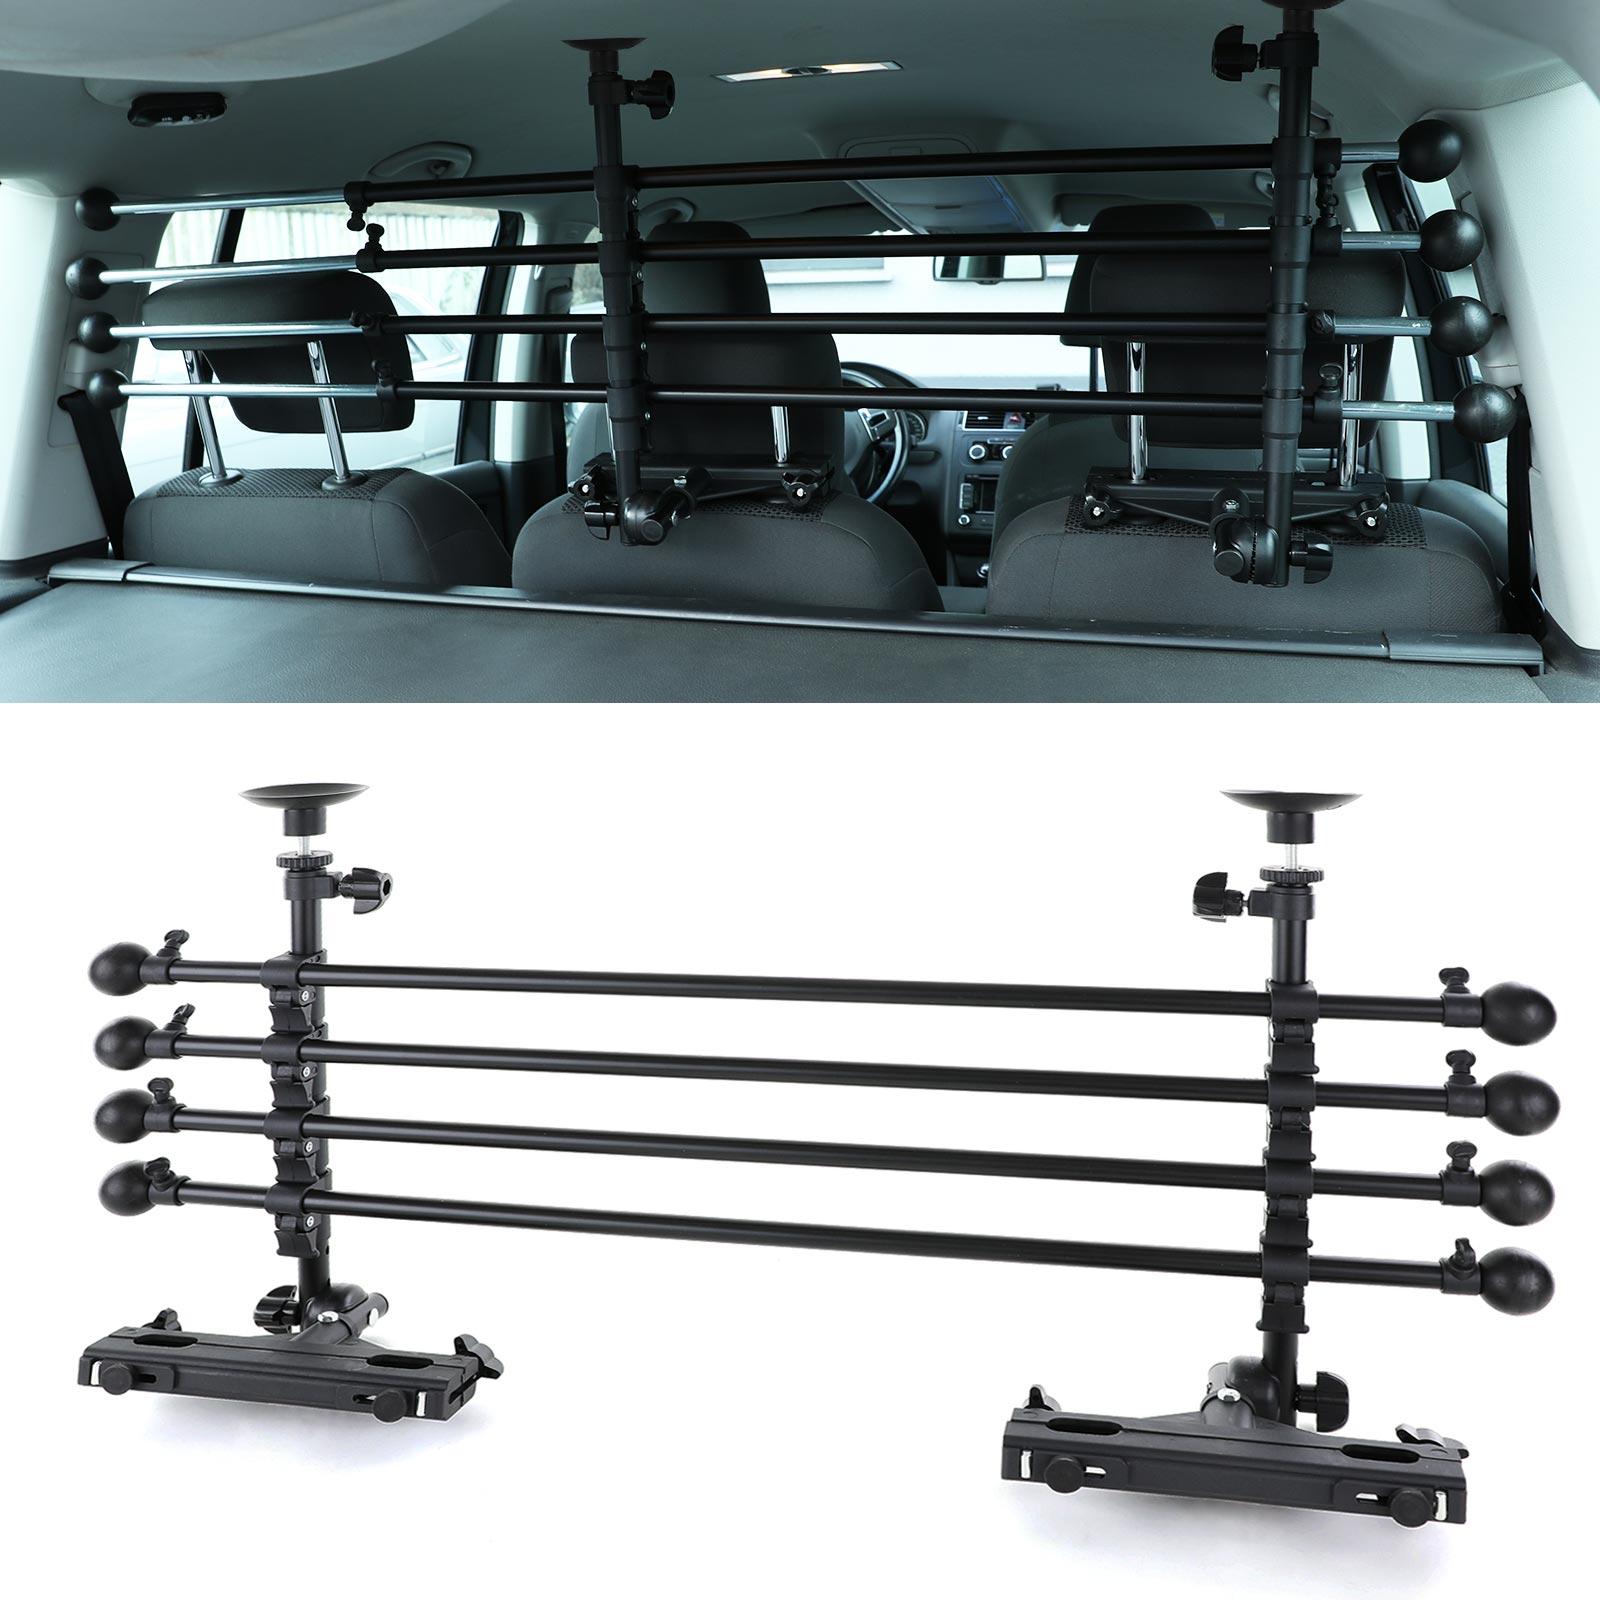 Tenzo-R 37784 PKW KFZ Auto Kombi Hundegitter Gep/äck Schutzgitter verstellbar universal